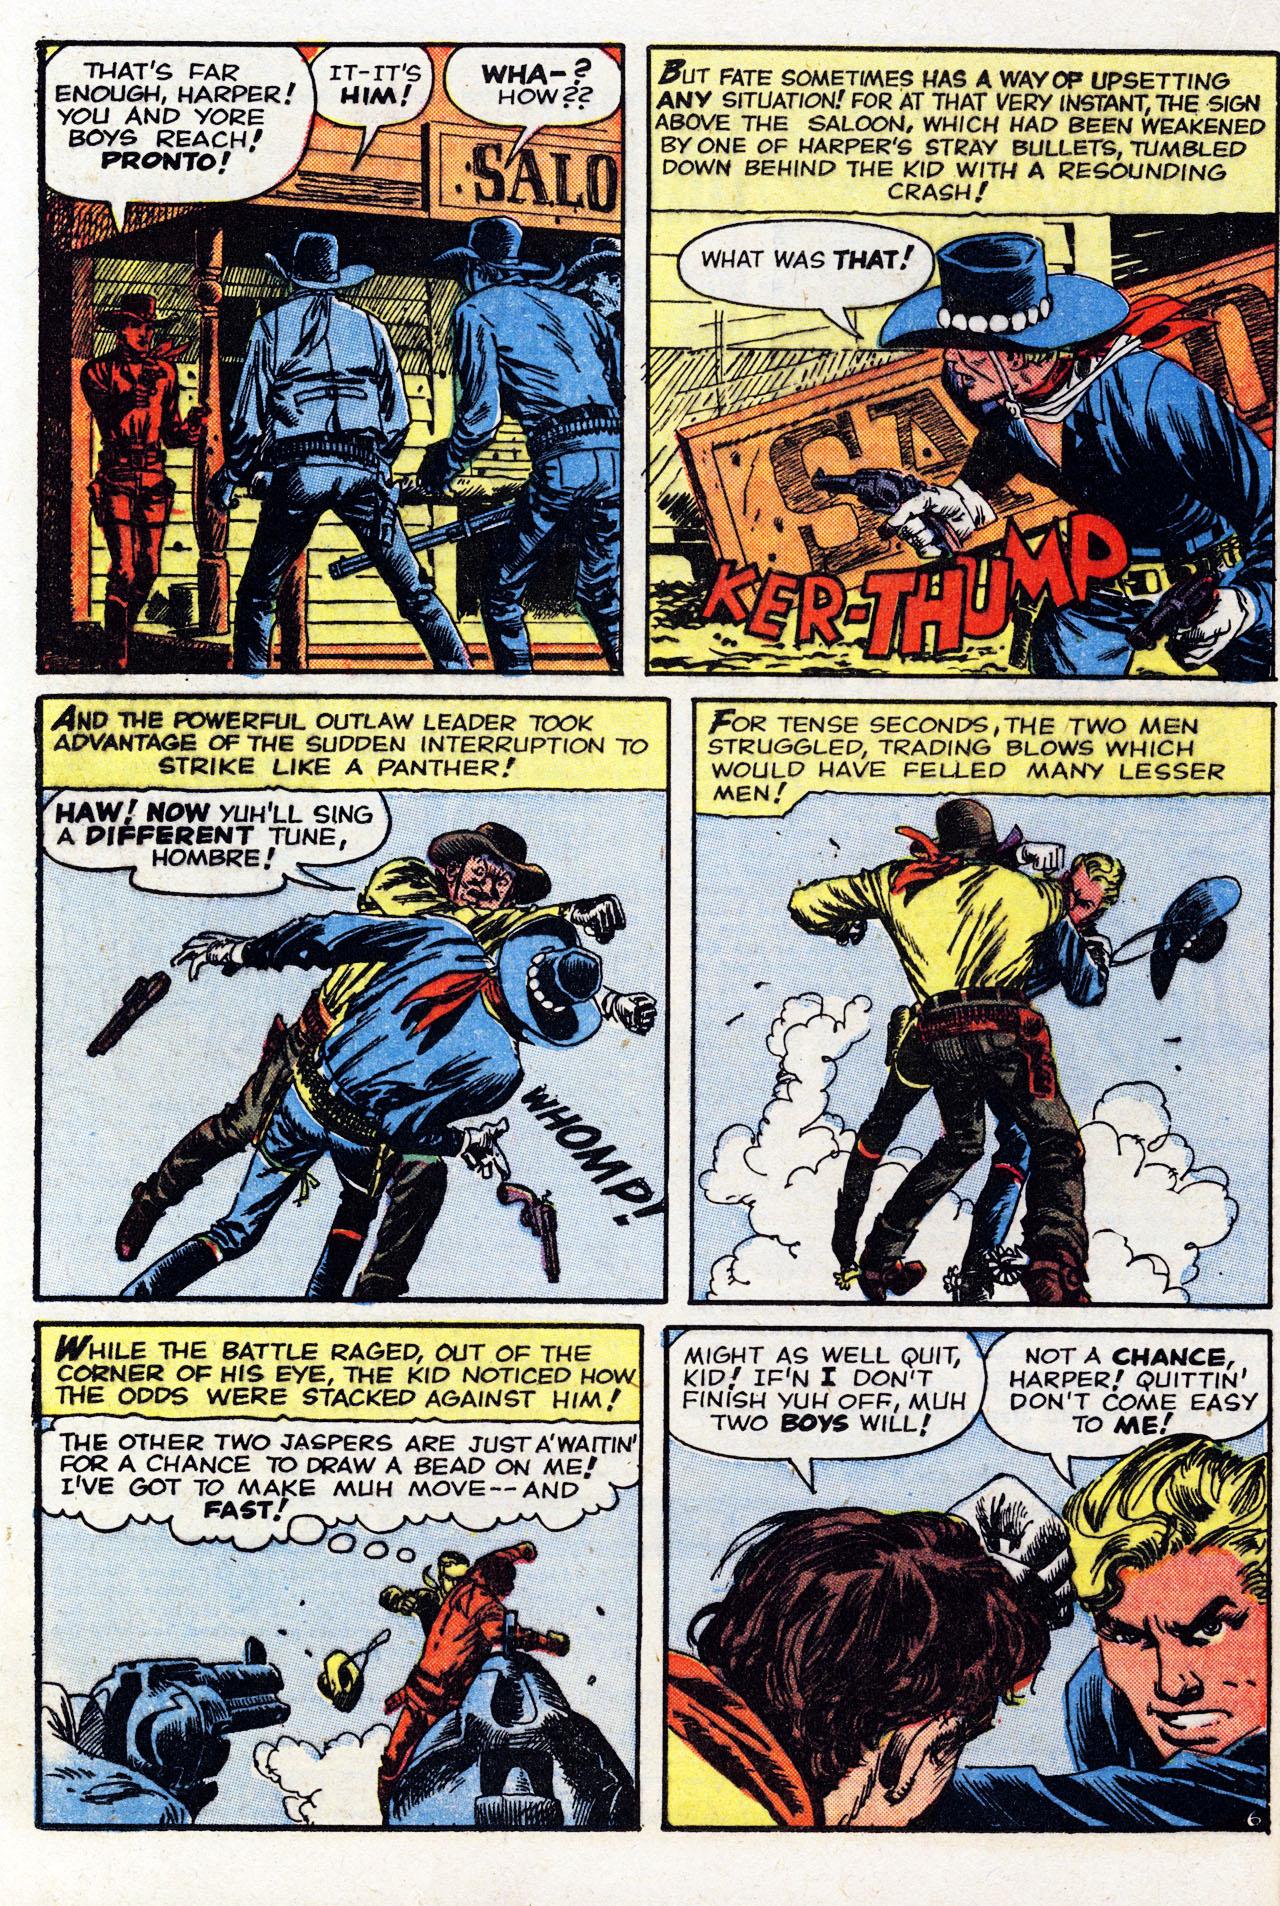 Read online Two-Gun Kid comic -  Issue #53 - 16